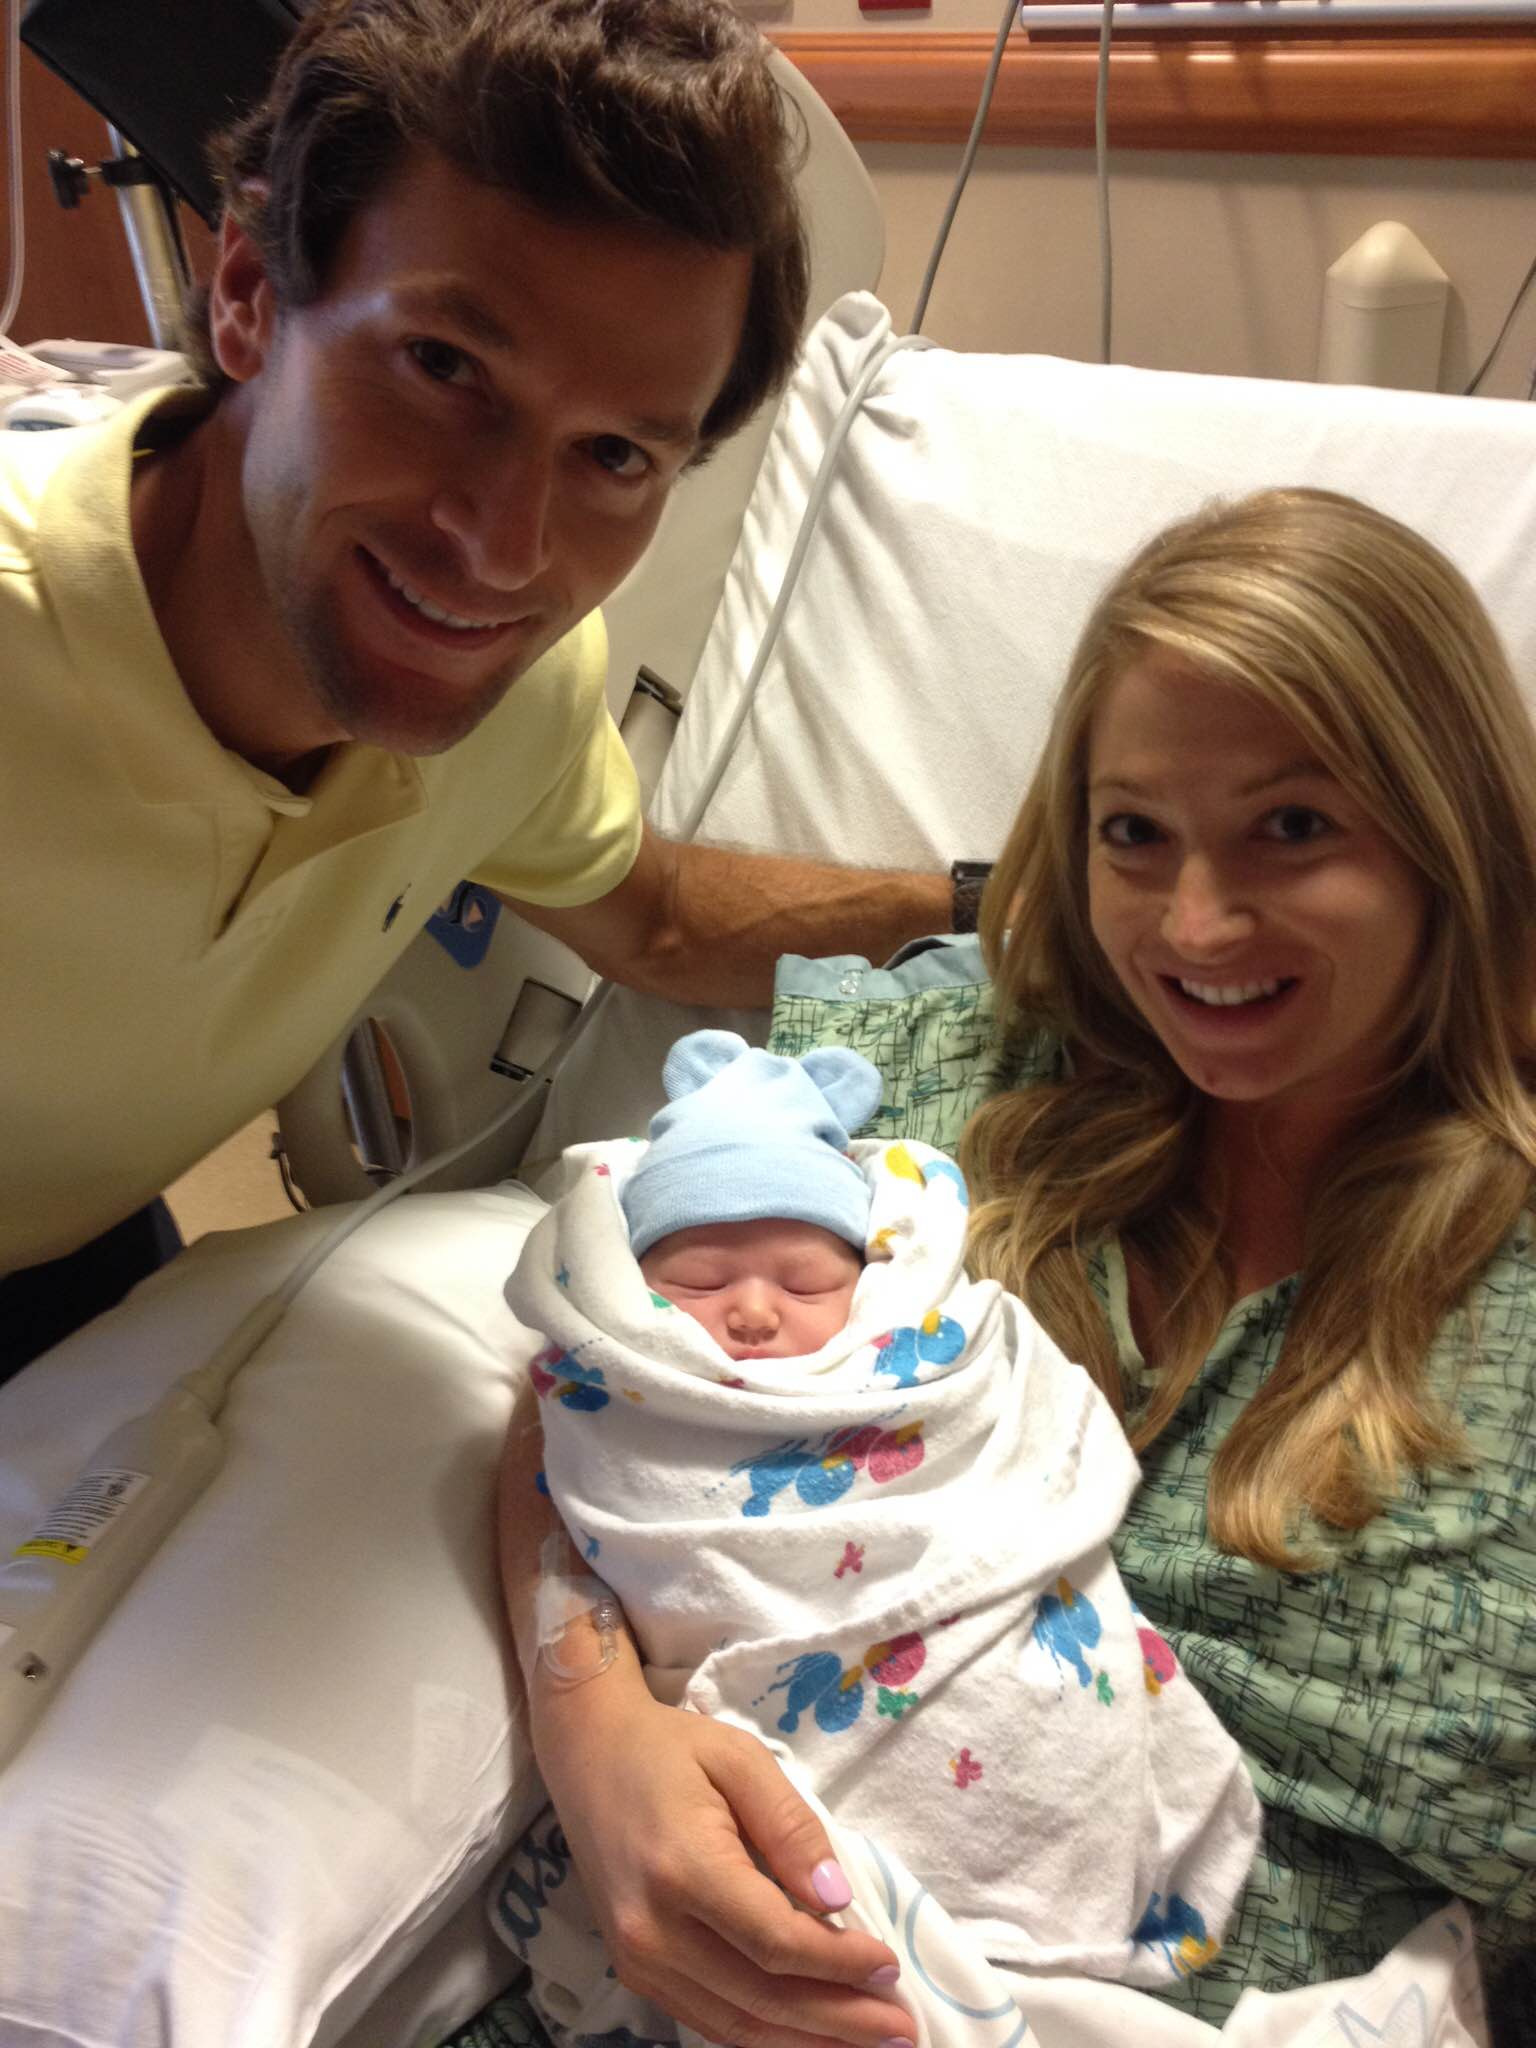 A New Mom's #1 Frenemy :: Social Media | Houston Moms Blog